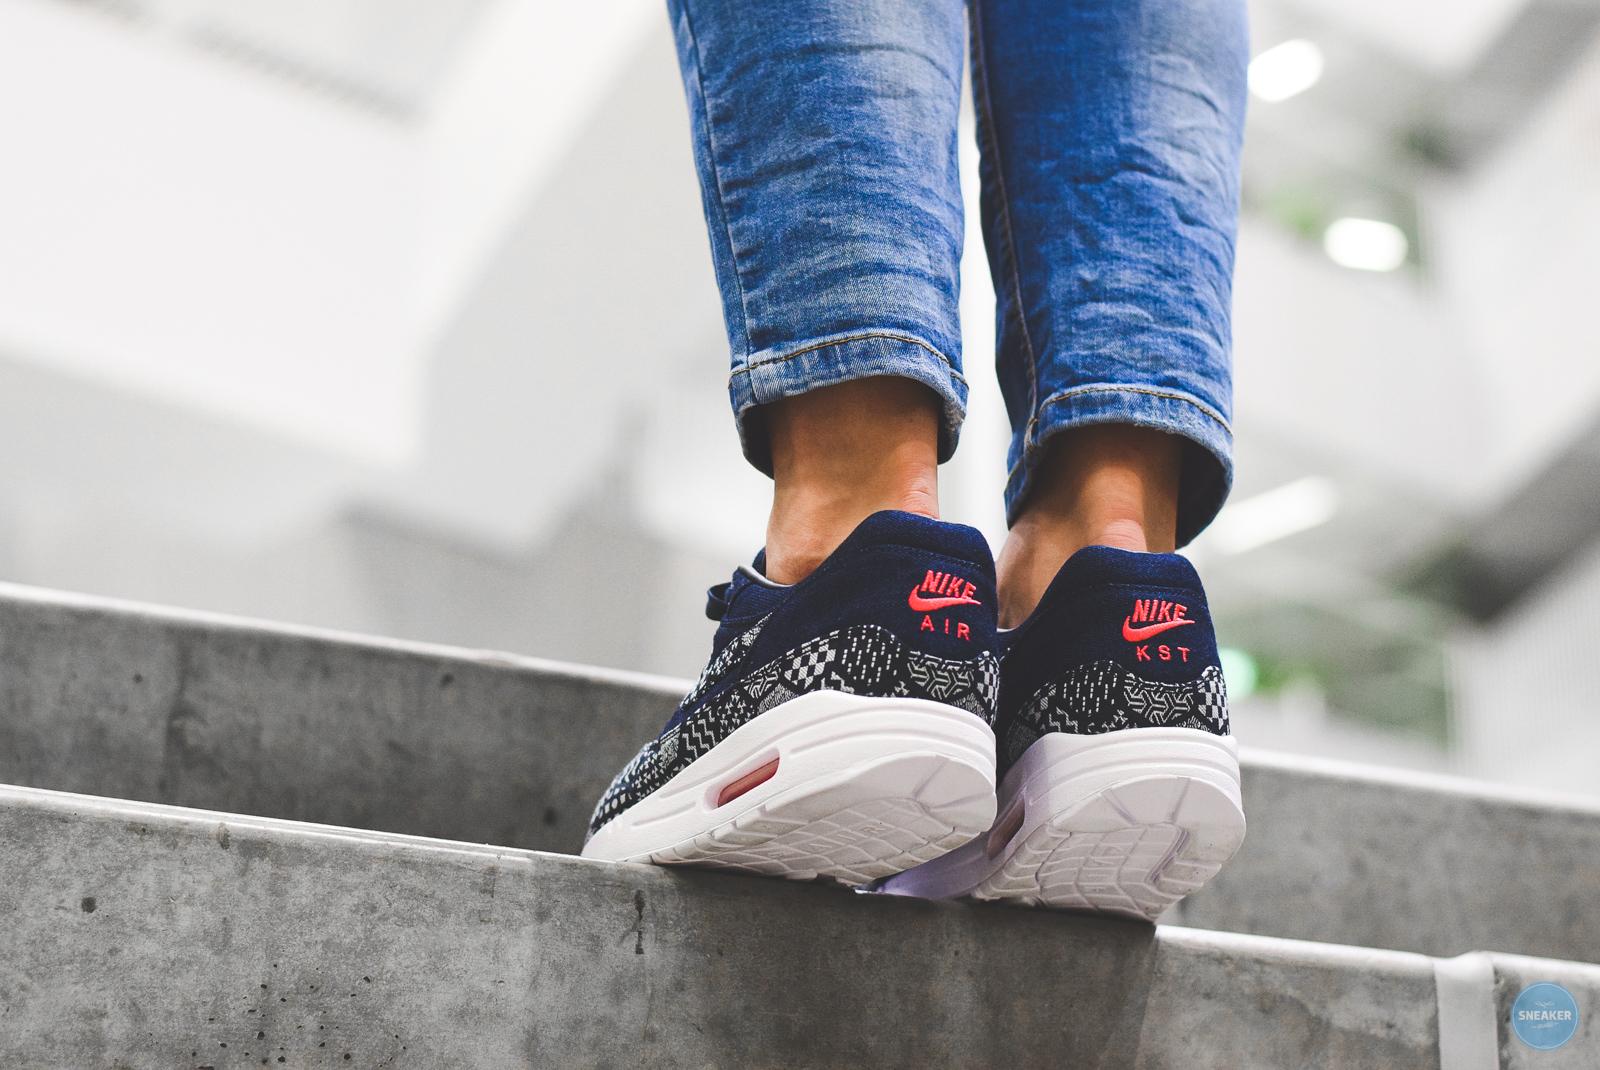 dee93c45d91 Nike Air Max 1 Premium iD Indigo Collection | Sneakerworld.dk